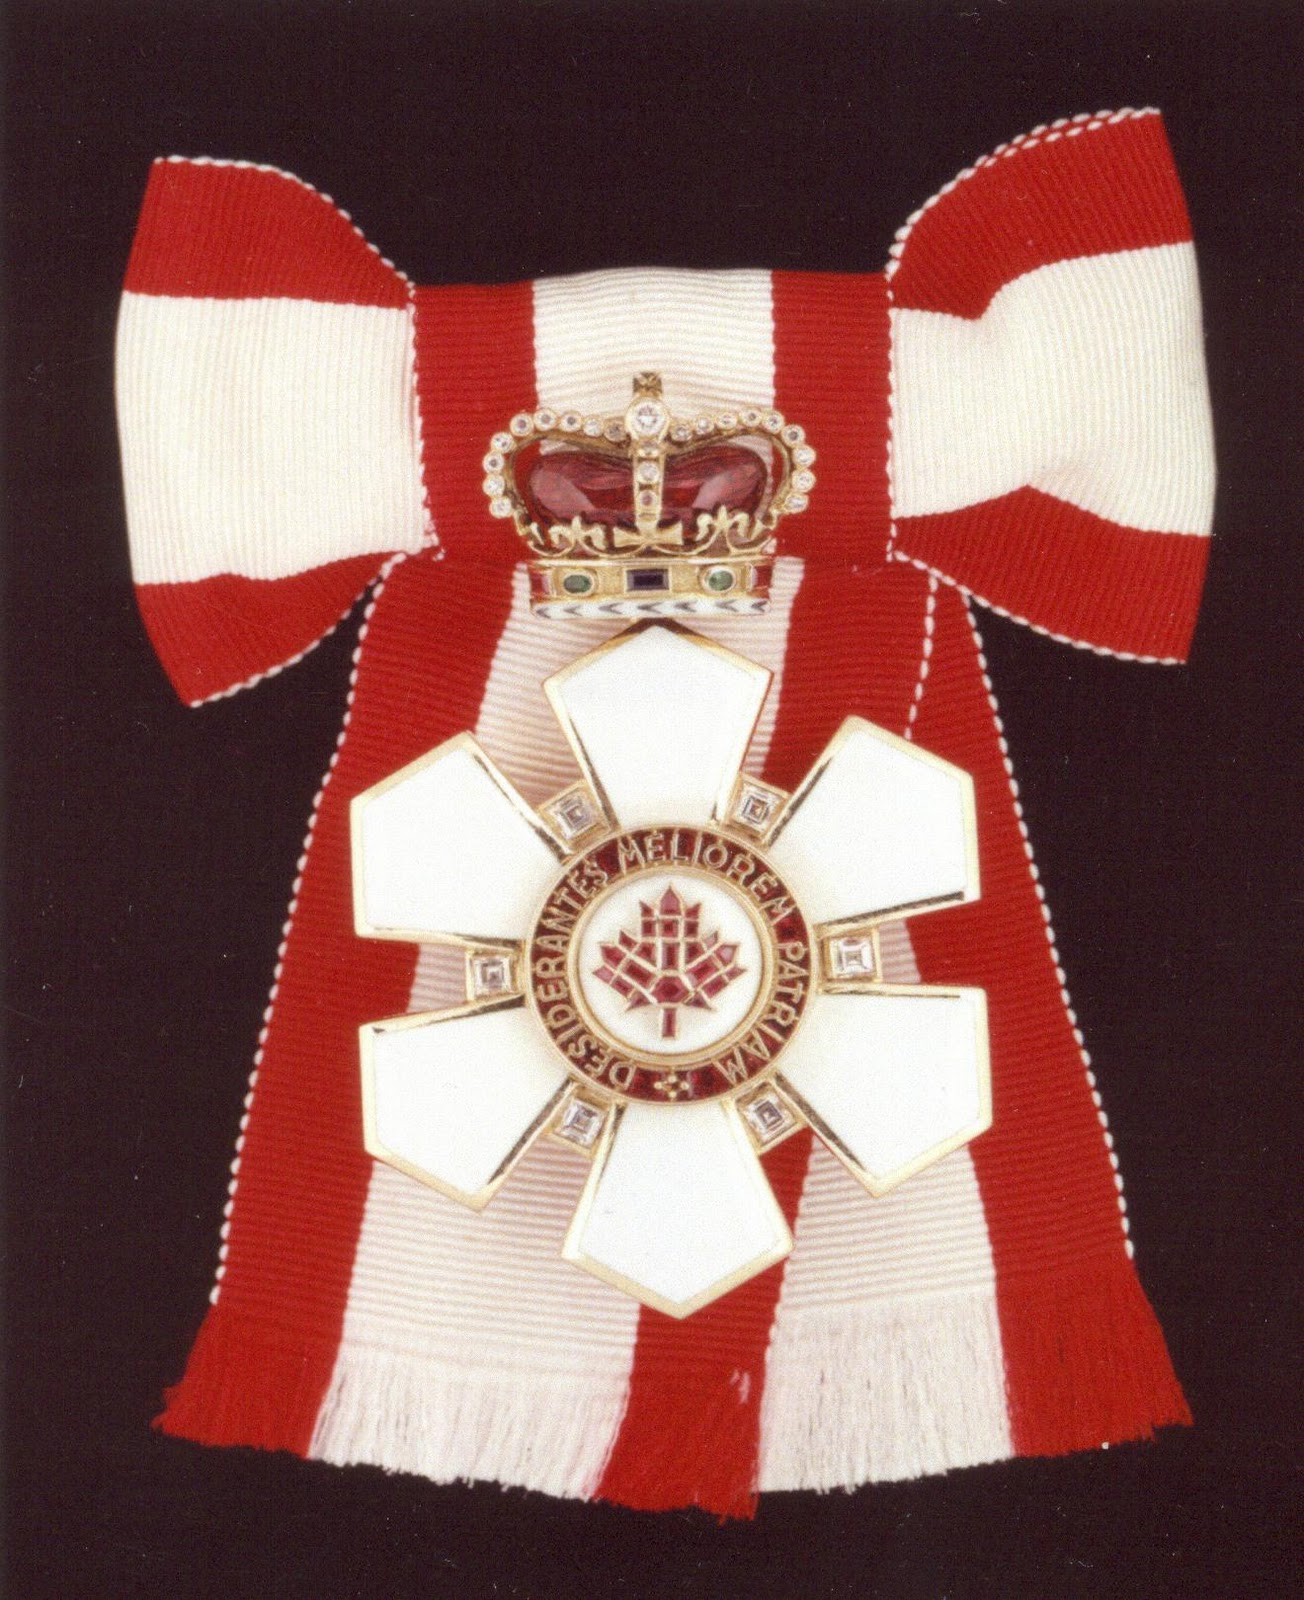 http://3.bp.blogspot.com/_5ROfllKLKUg/TJwKxMfpOkI/AAAAAAAAAj8/5_2MlX6UtGM/s1600/Sovereign+of+the+Order+of+Canada.jpg